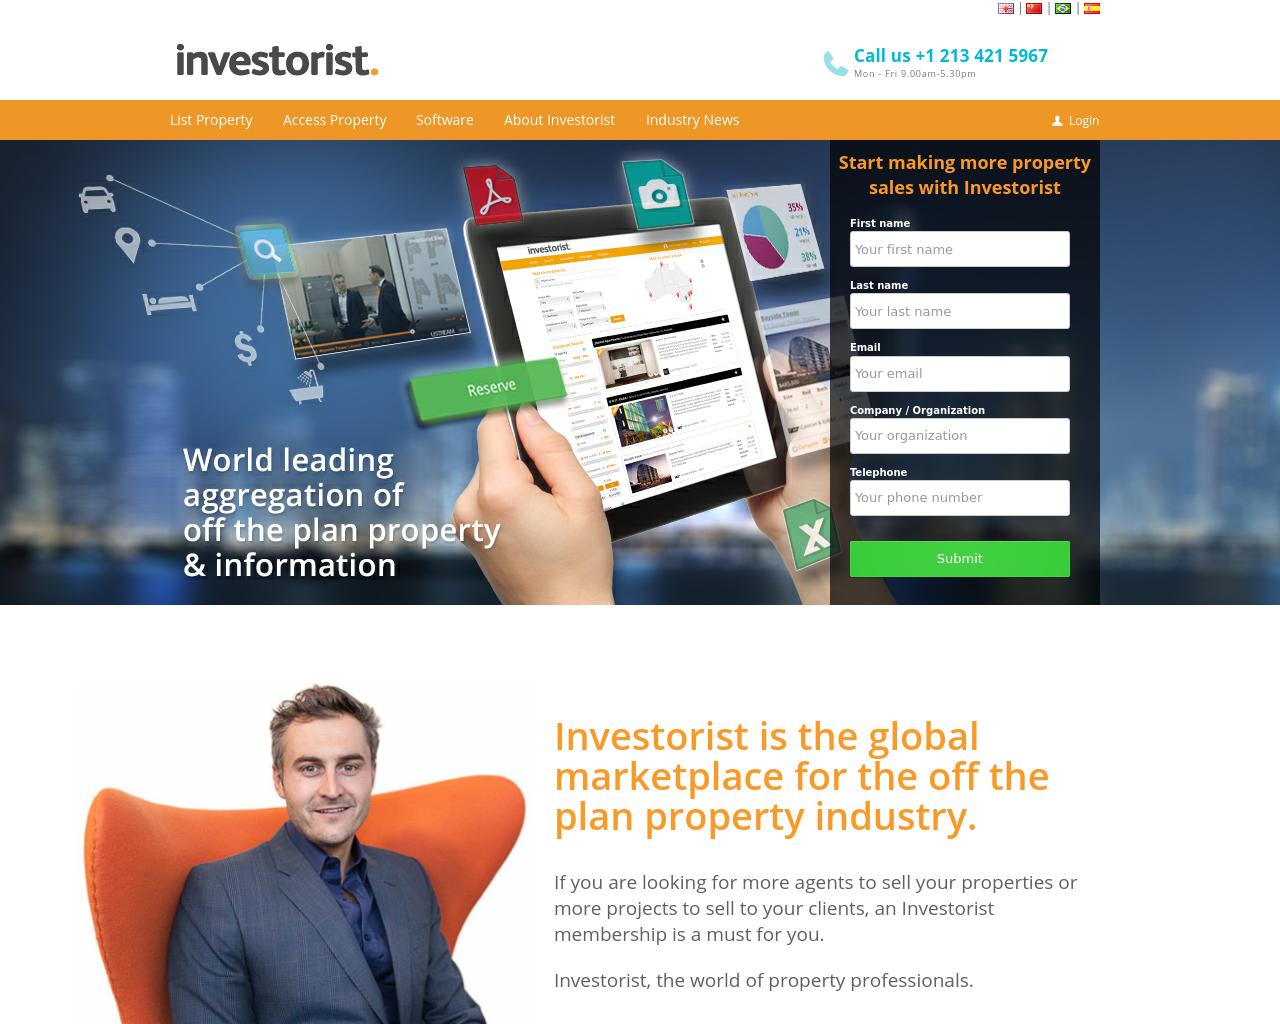 Investorist-Advertising-Reviews-Pricing